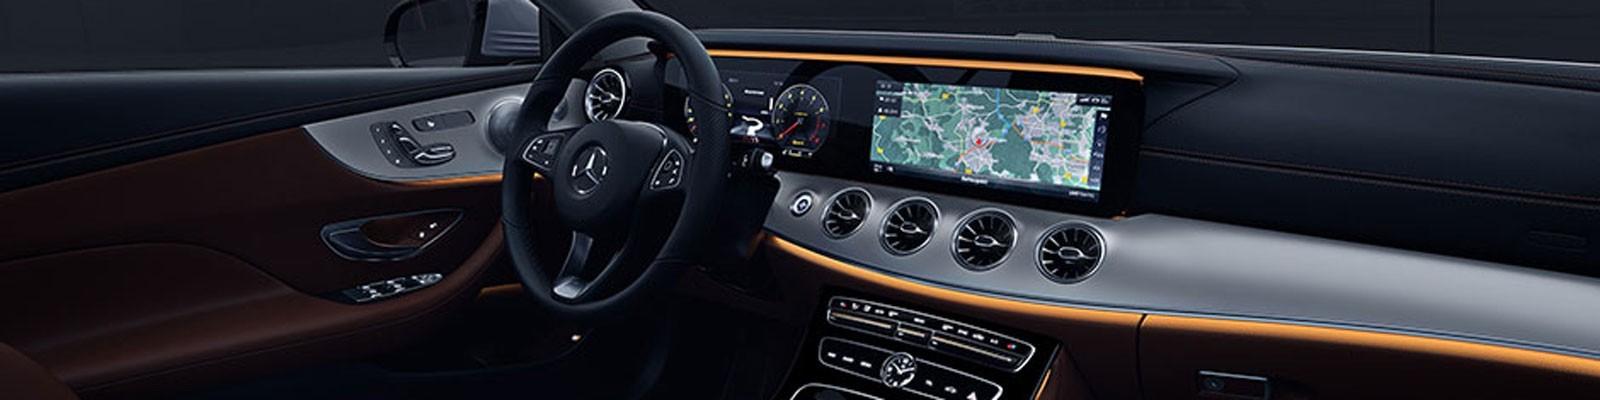 2018-e-class-coupe-interior-1